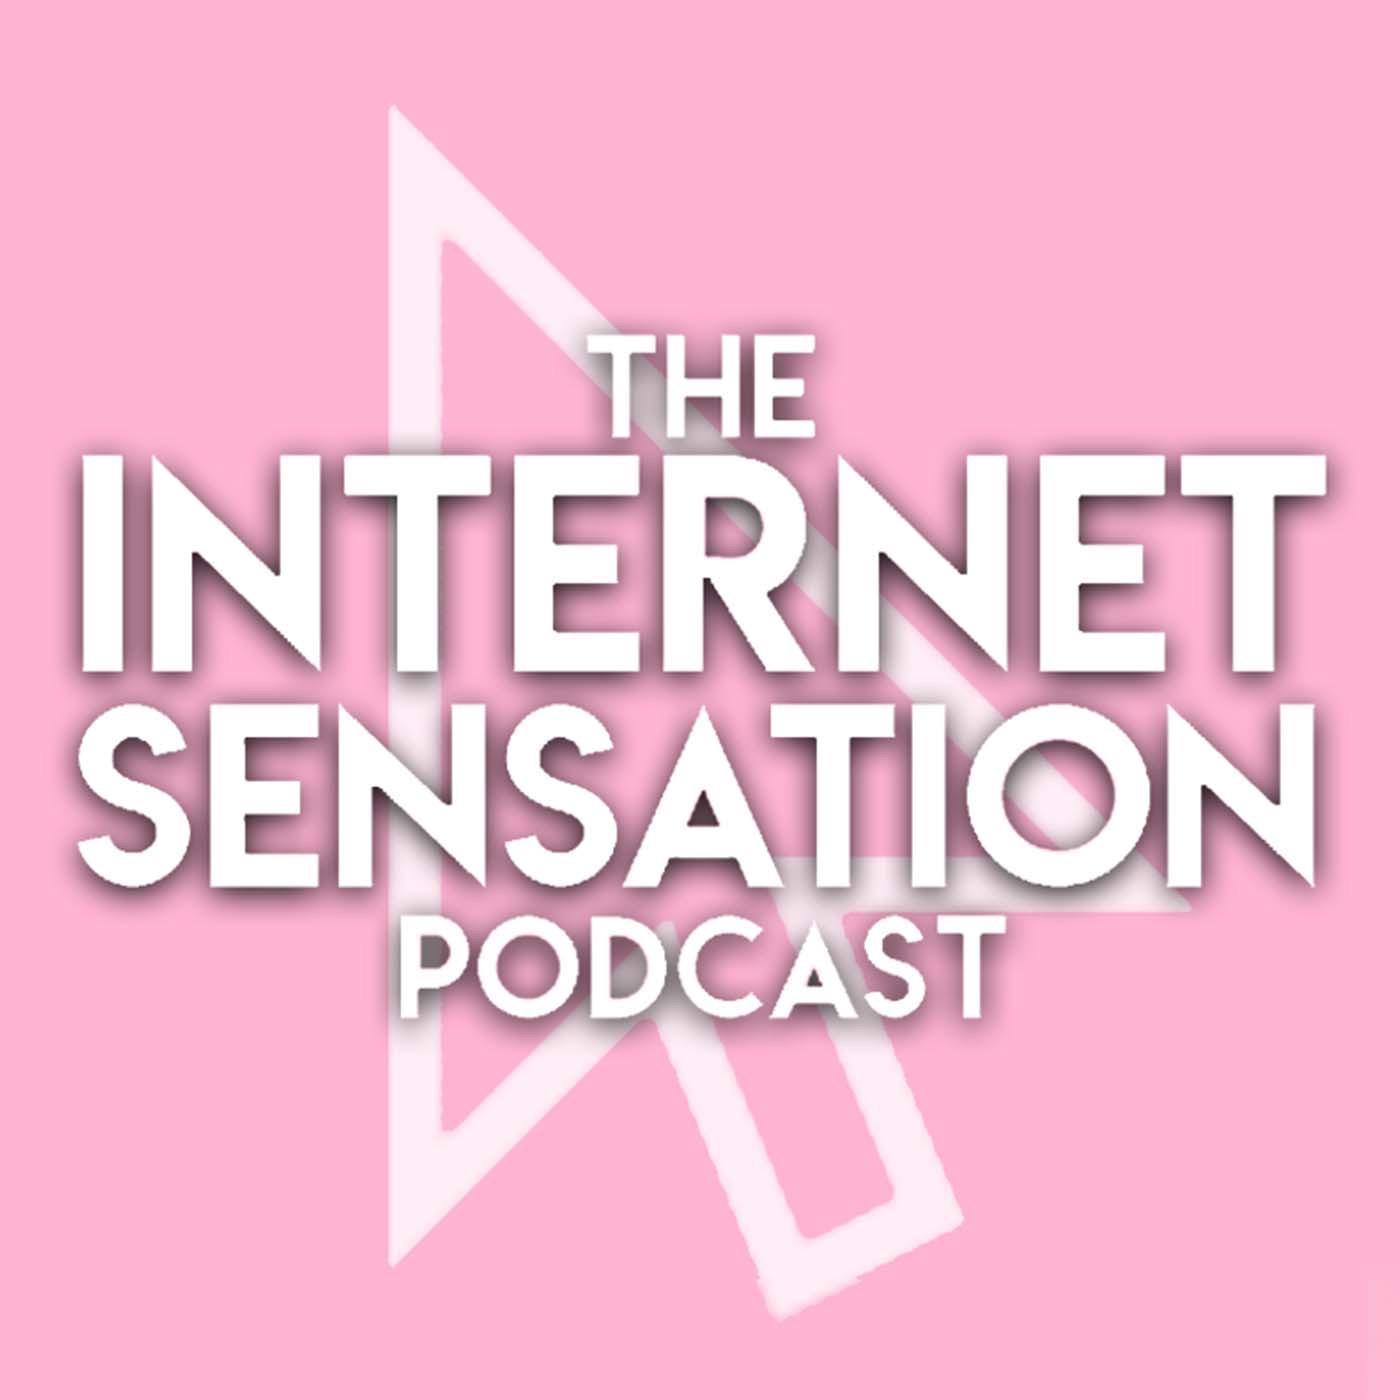 Internet Sensation Podcast